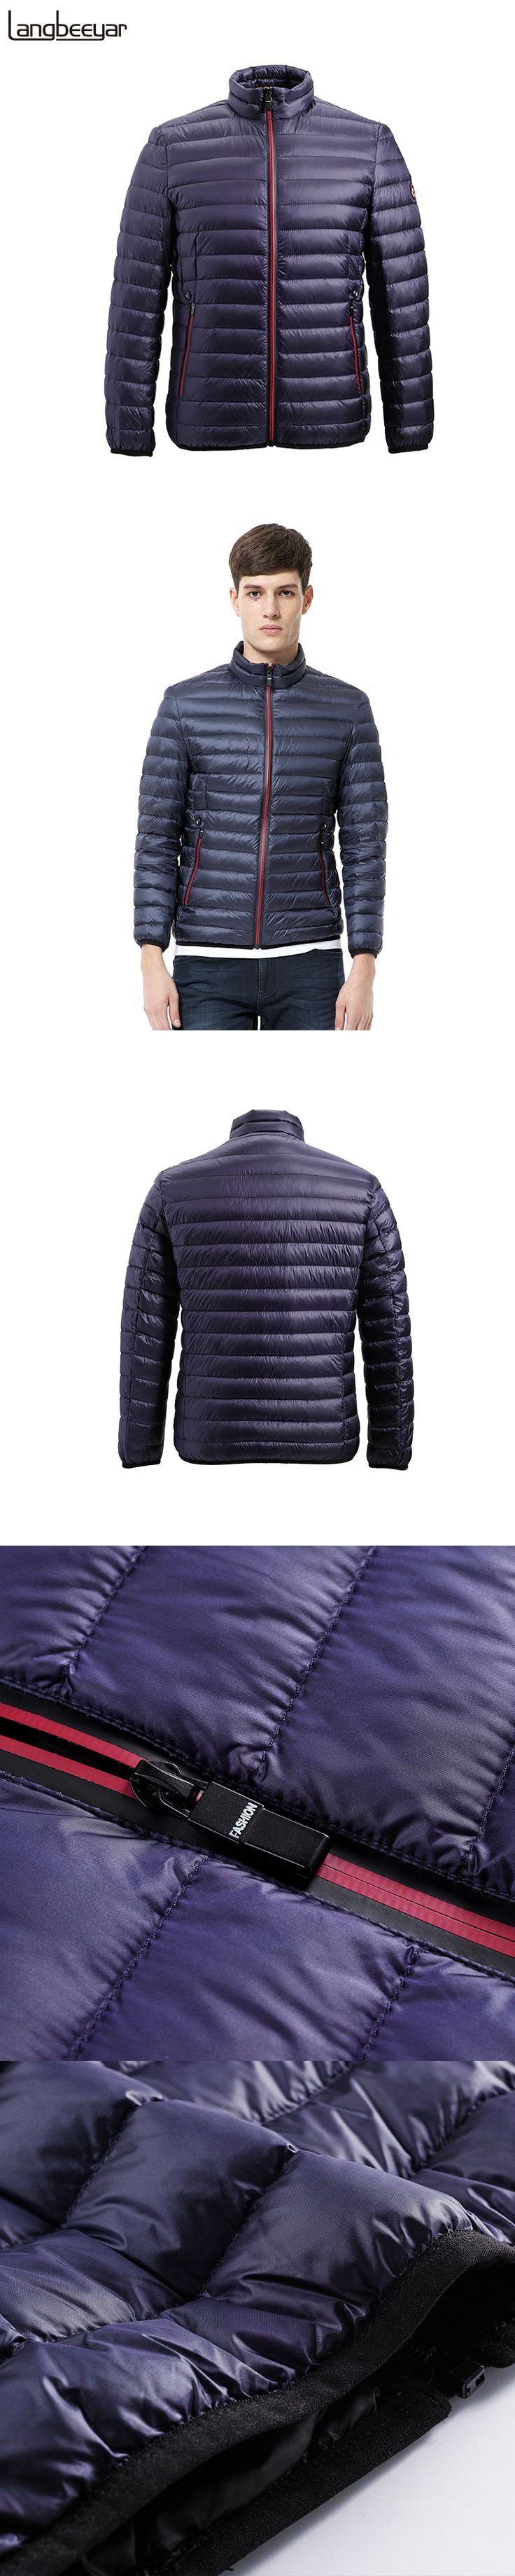 New Fashion Brand Clothing Men Down Jacket Men Winter Stand Collar Short Men Jacket Winter Parka Senior Mens Jackets And Coats